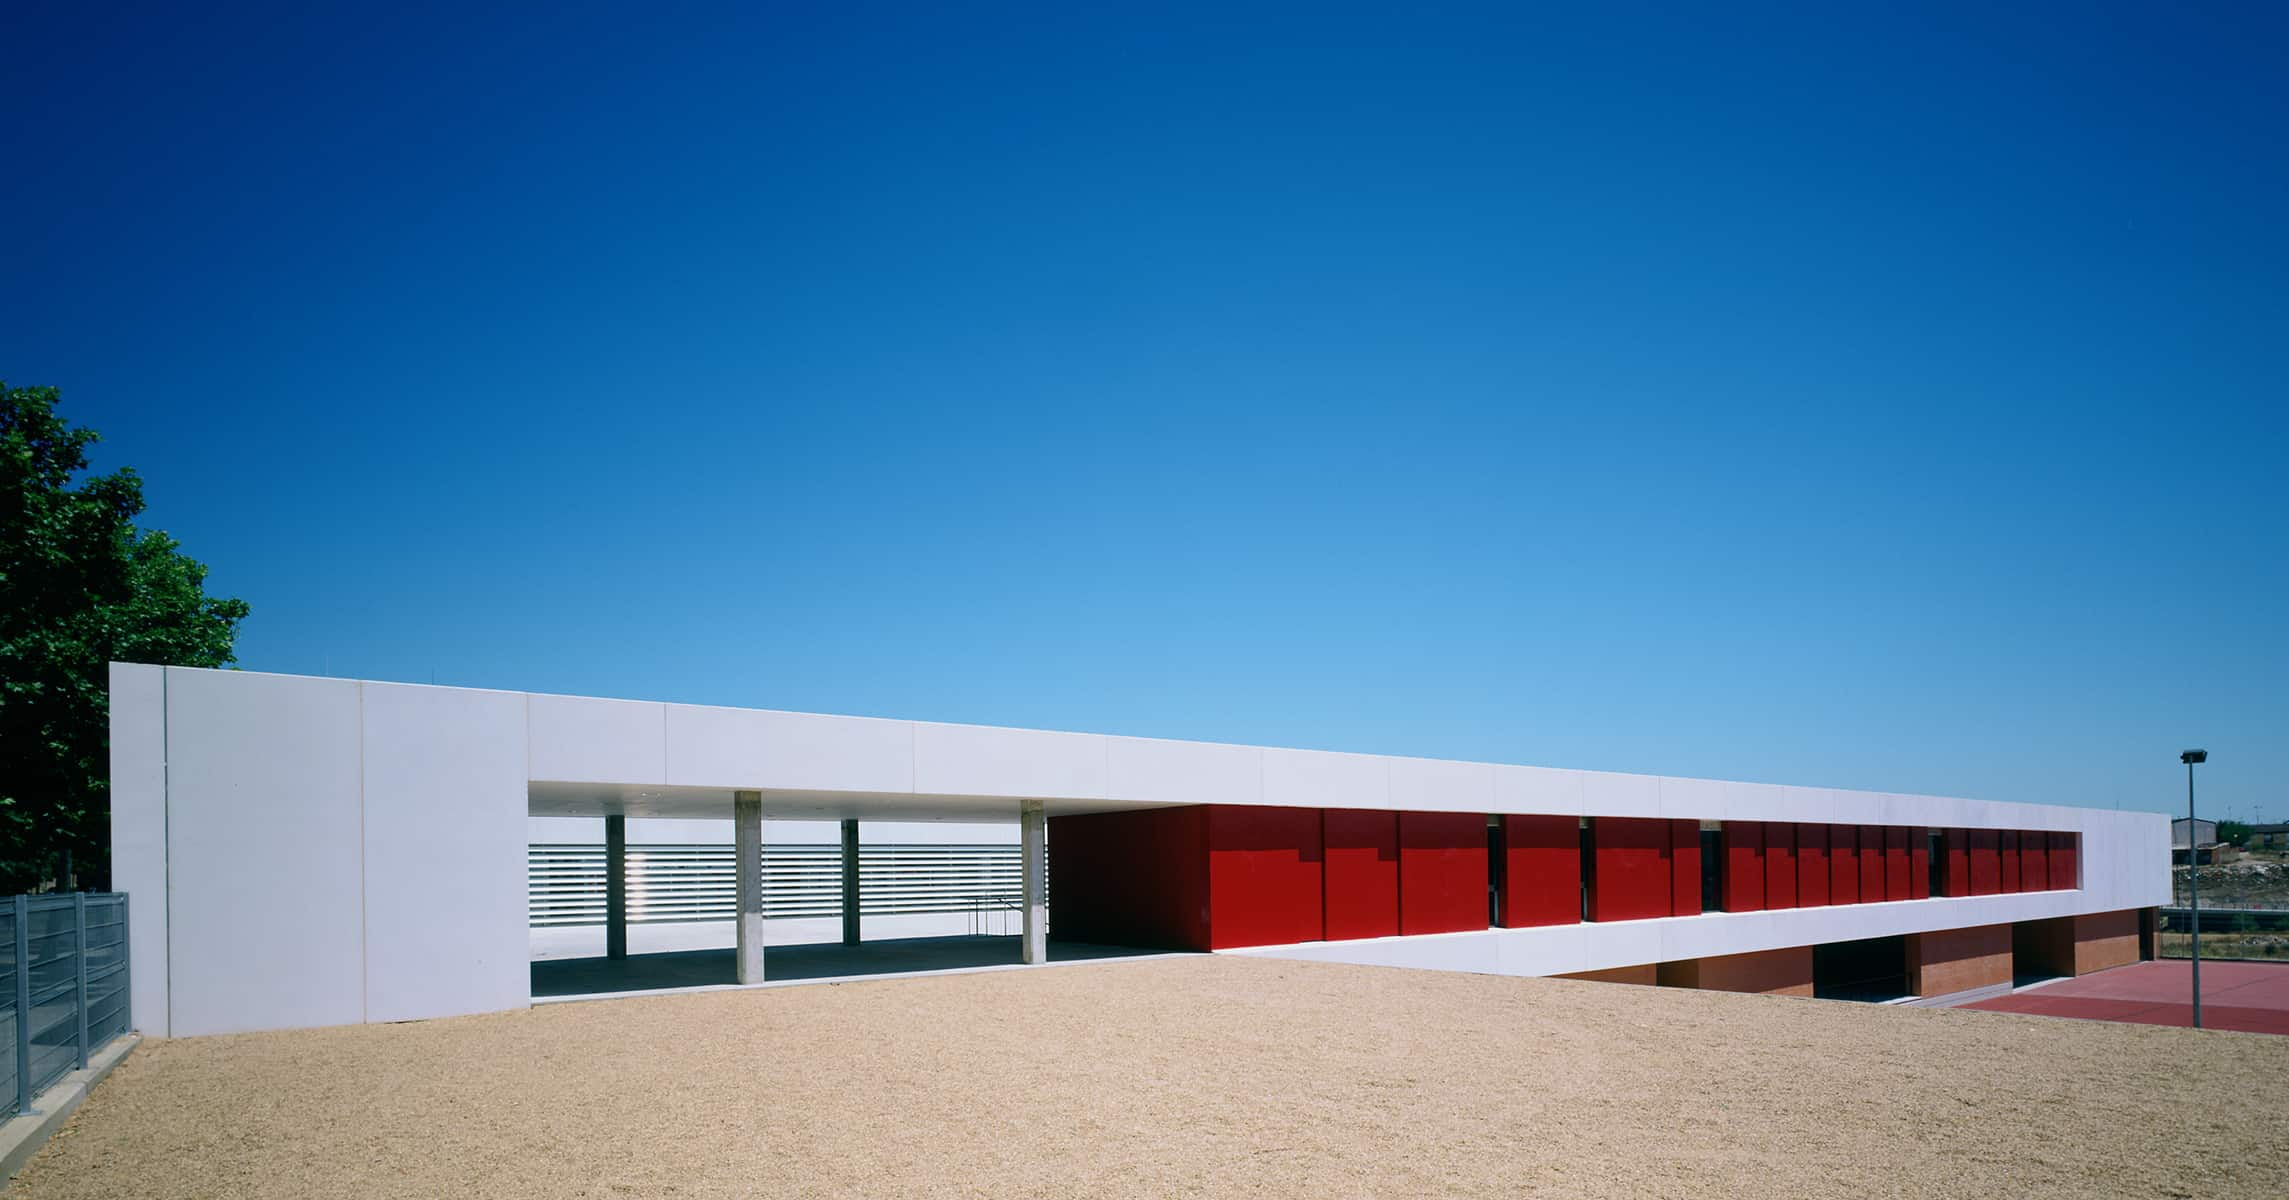 IES BADAJOZ - arquitectura escolar extremadura - LANDINEZ+REY   equipo L2G arquitectos, slp [ eL2Gaa ]